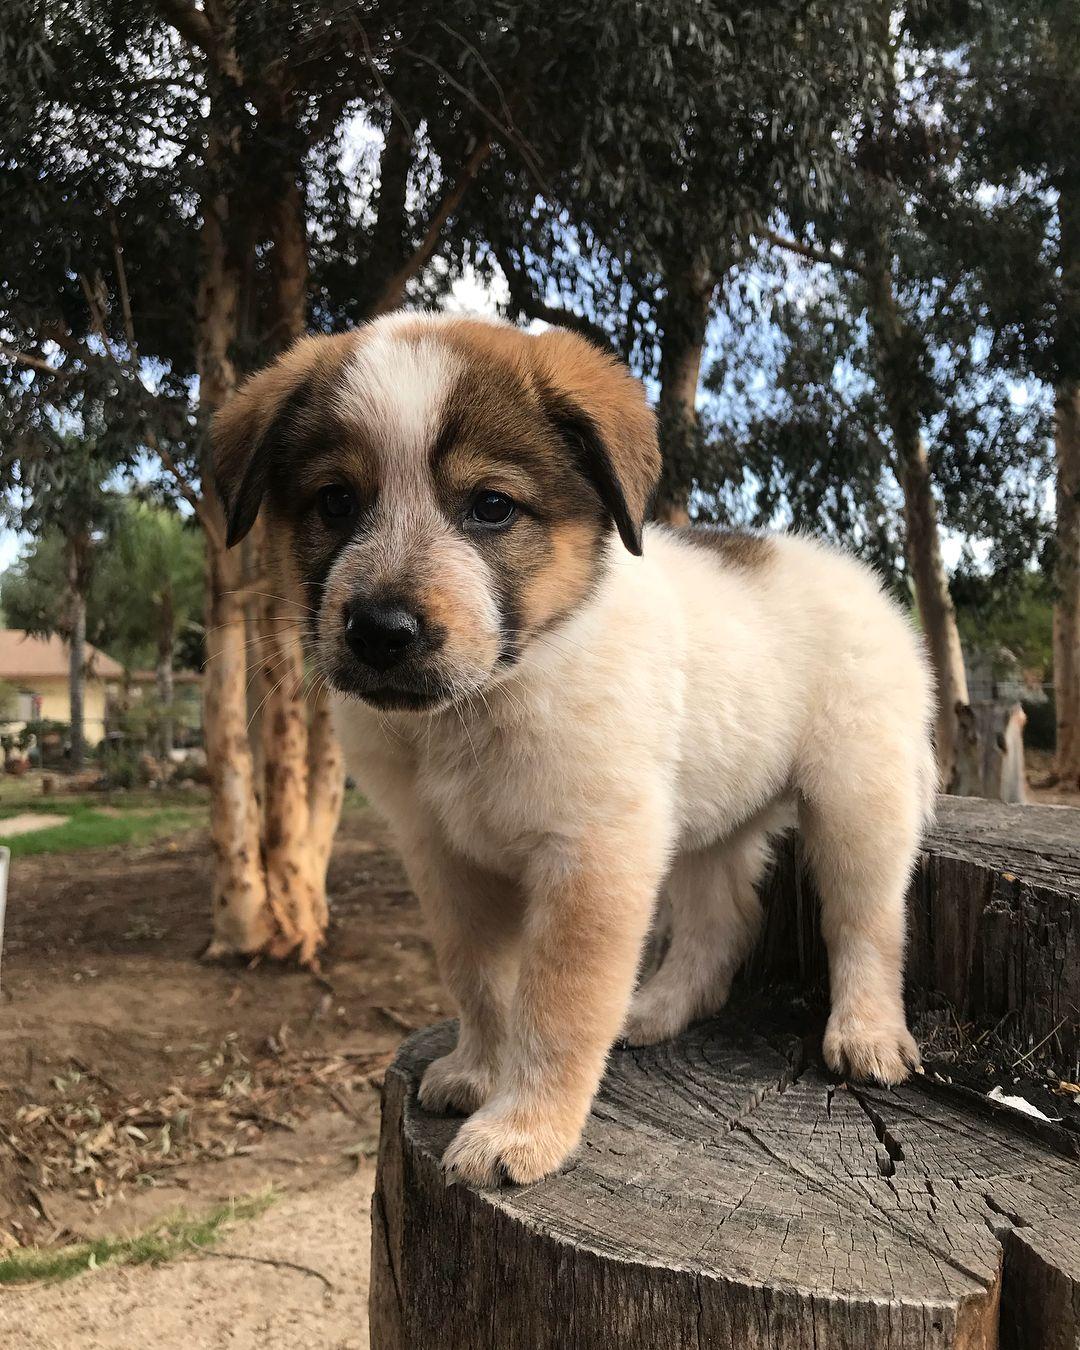 Australian Shepherd & Rottweiler mix named JagerAustralian Shepherd Rottweiler Mix Information